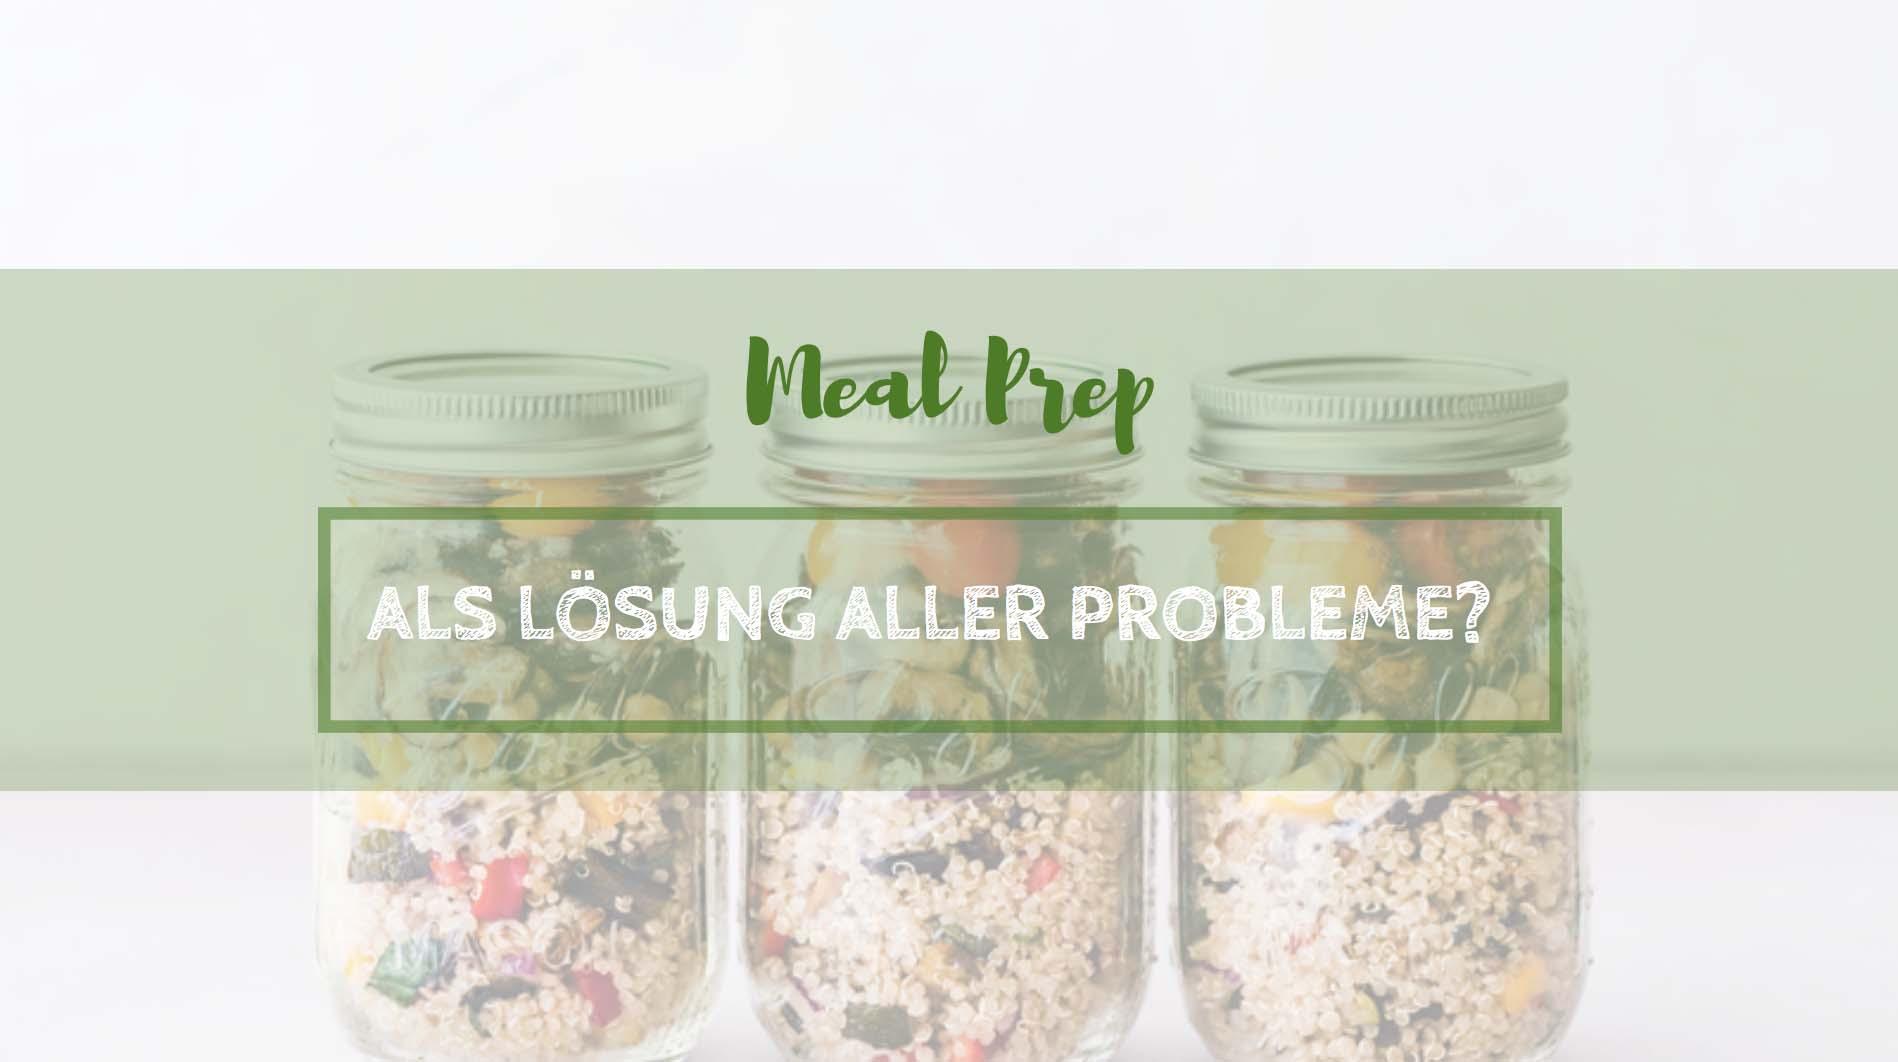 Meal Prep als Lösung aller Probleme?